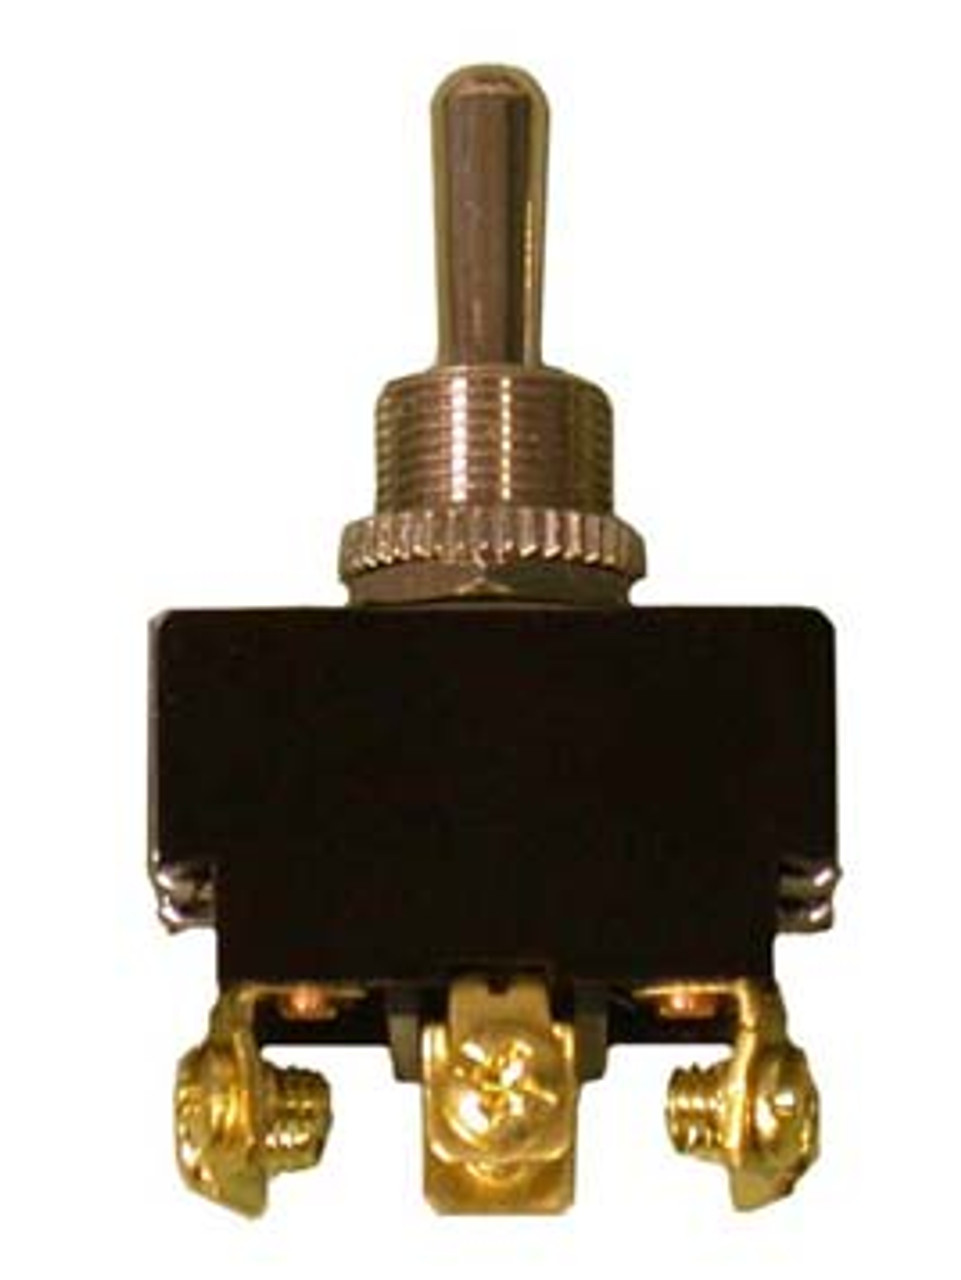 577 --- Medium Duty Toggle Switch